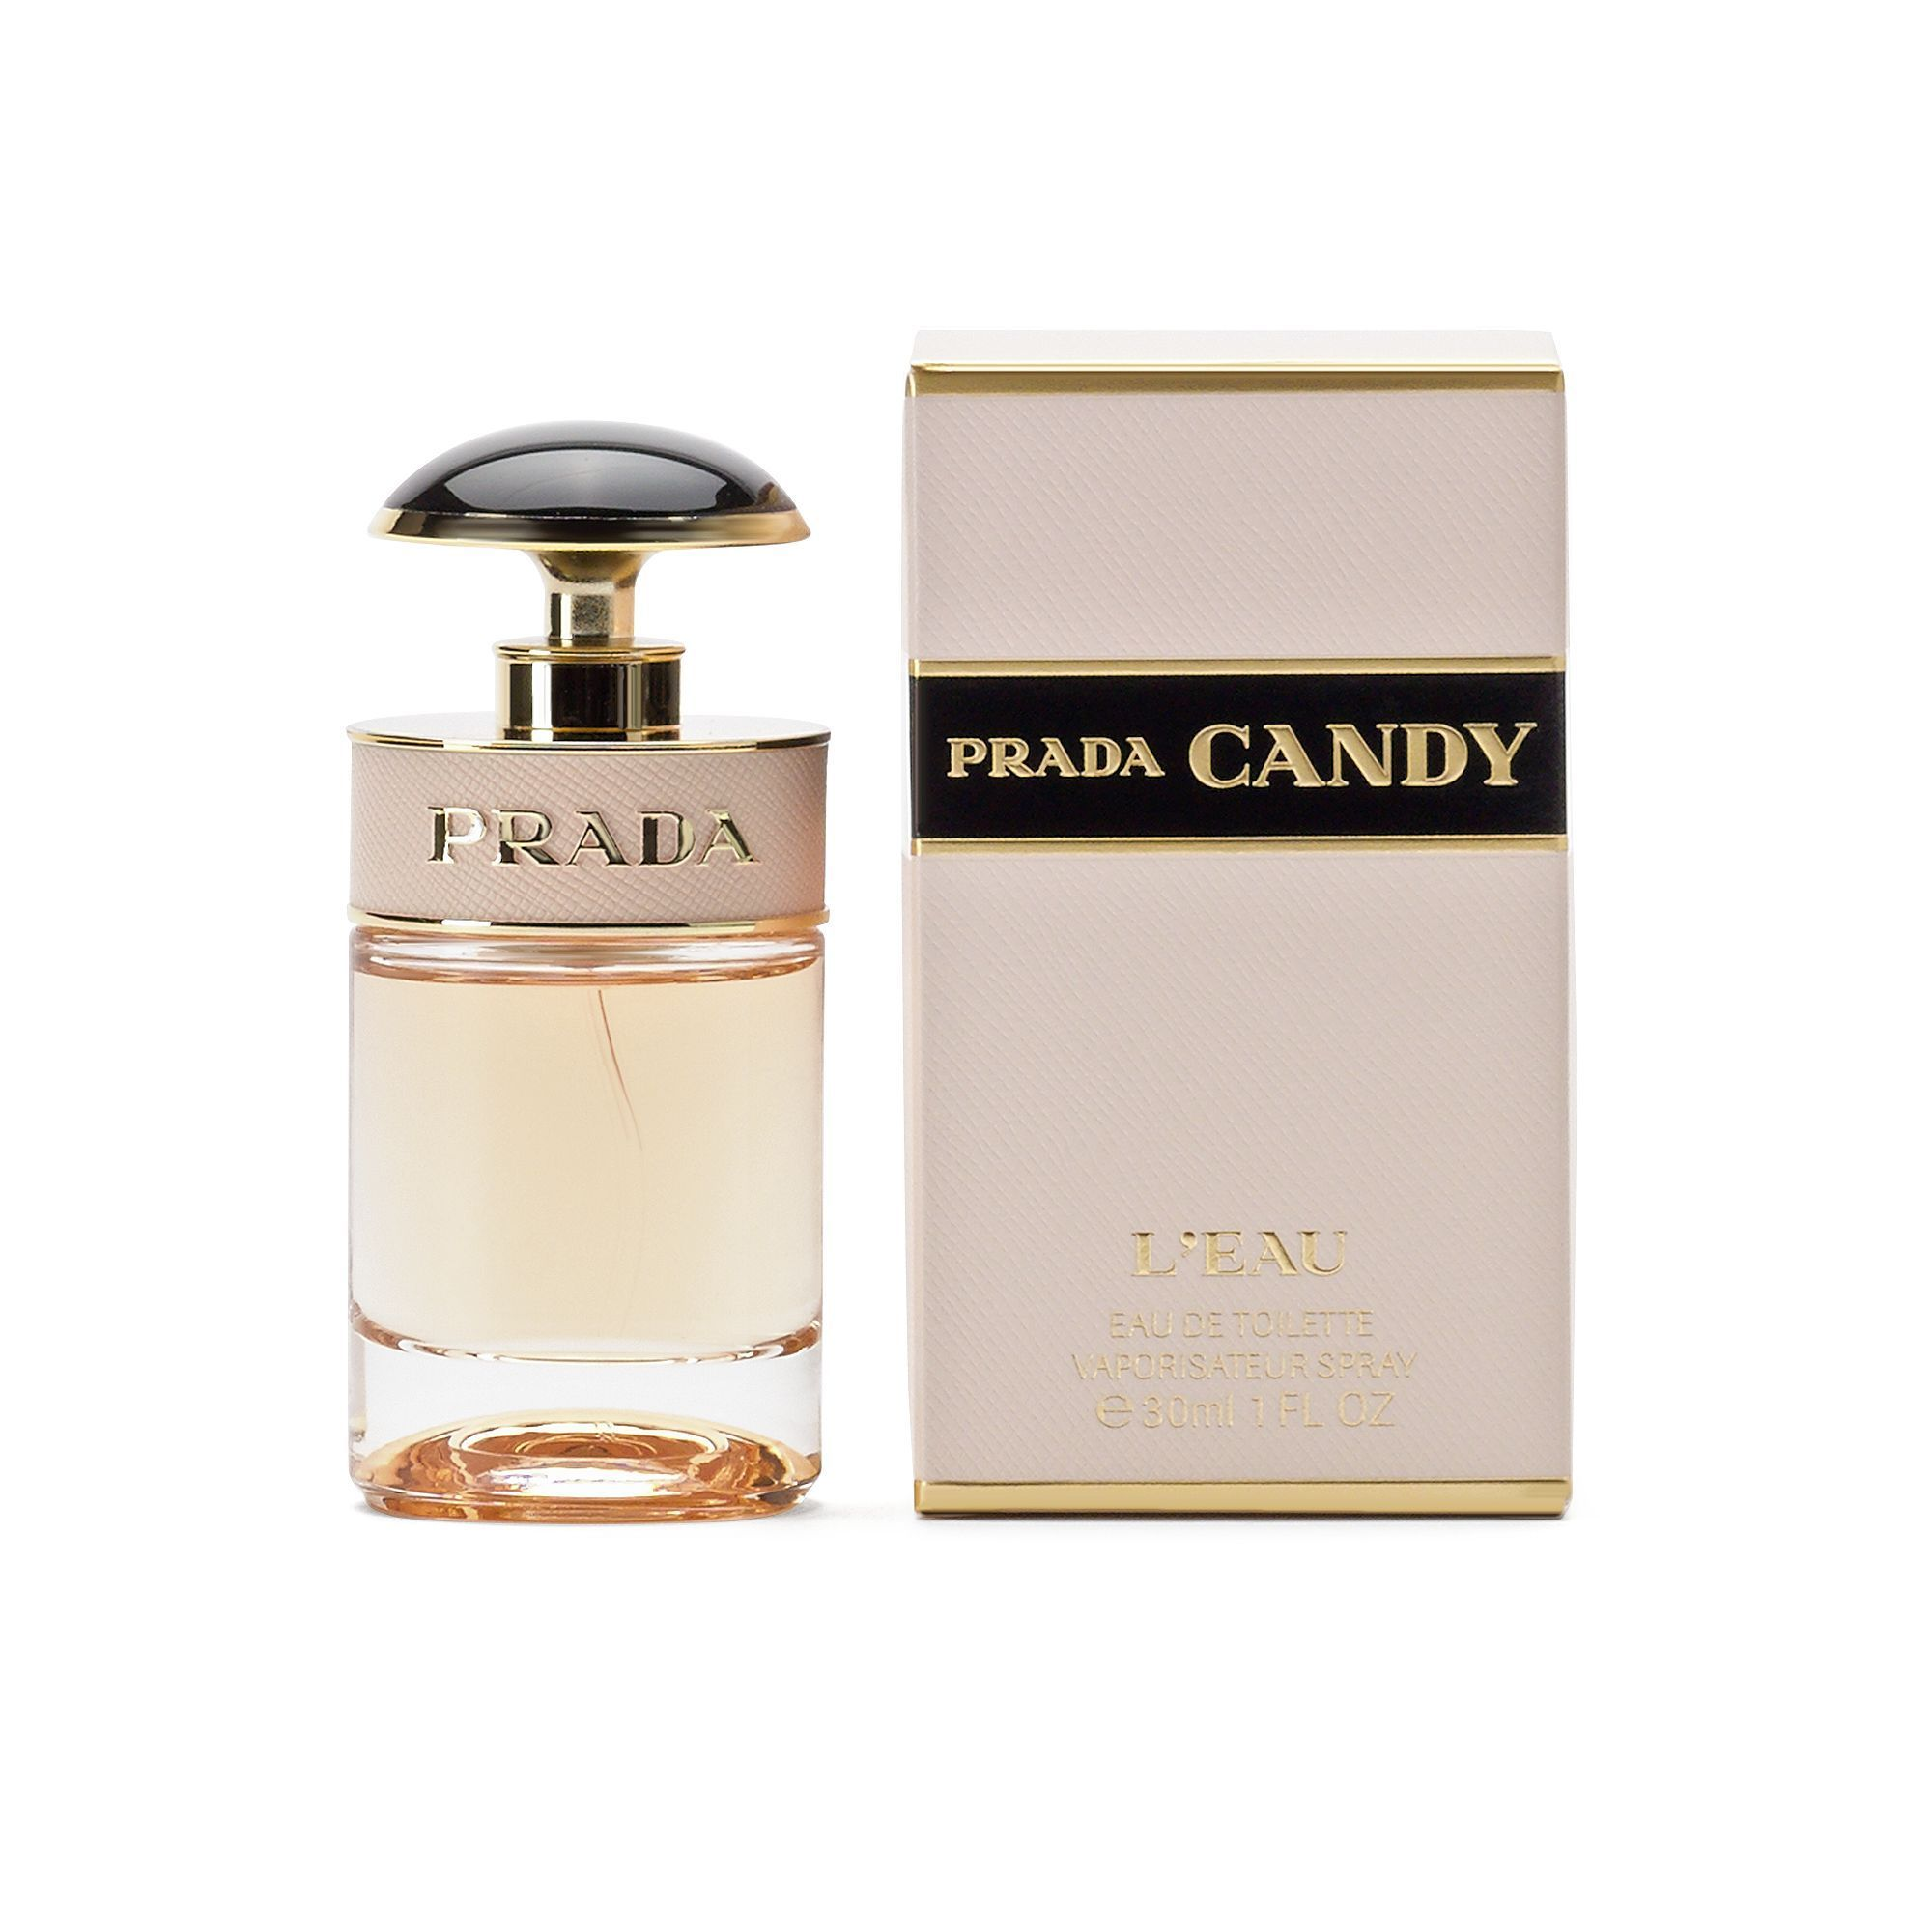 c81d7a58e Prada Candy L'Eau Women's Perfume | Products | Prada candy, Perfume ...